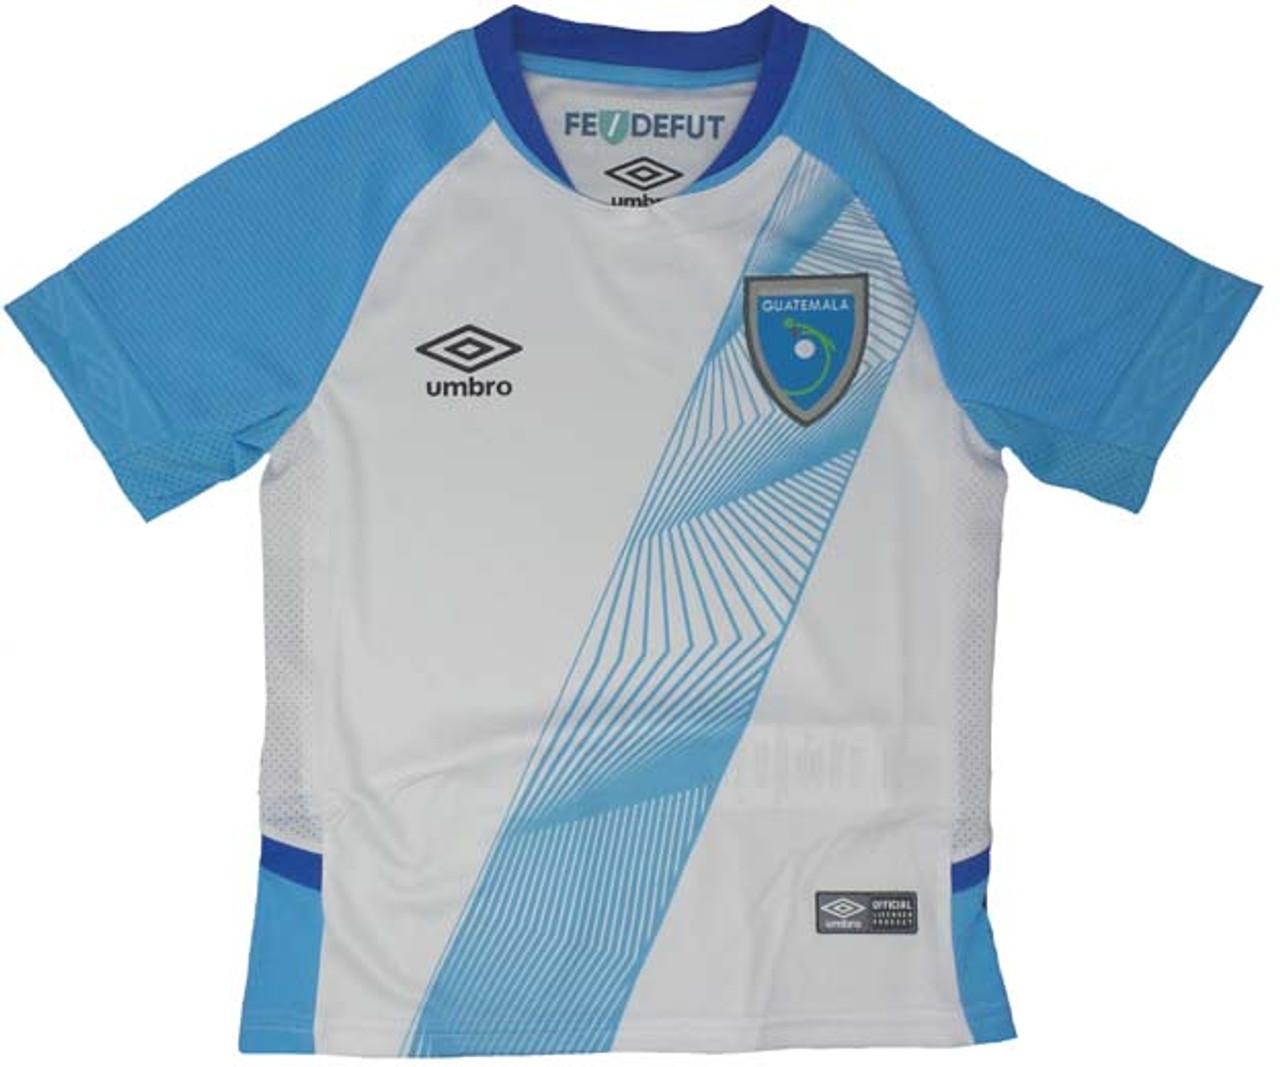 umbro guatemala jersey 2019